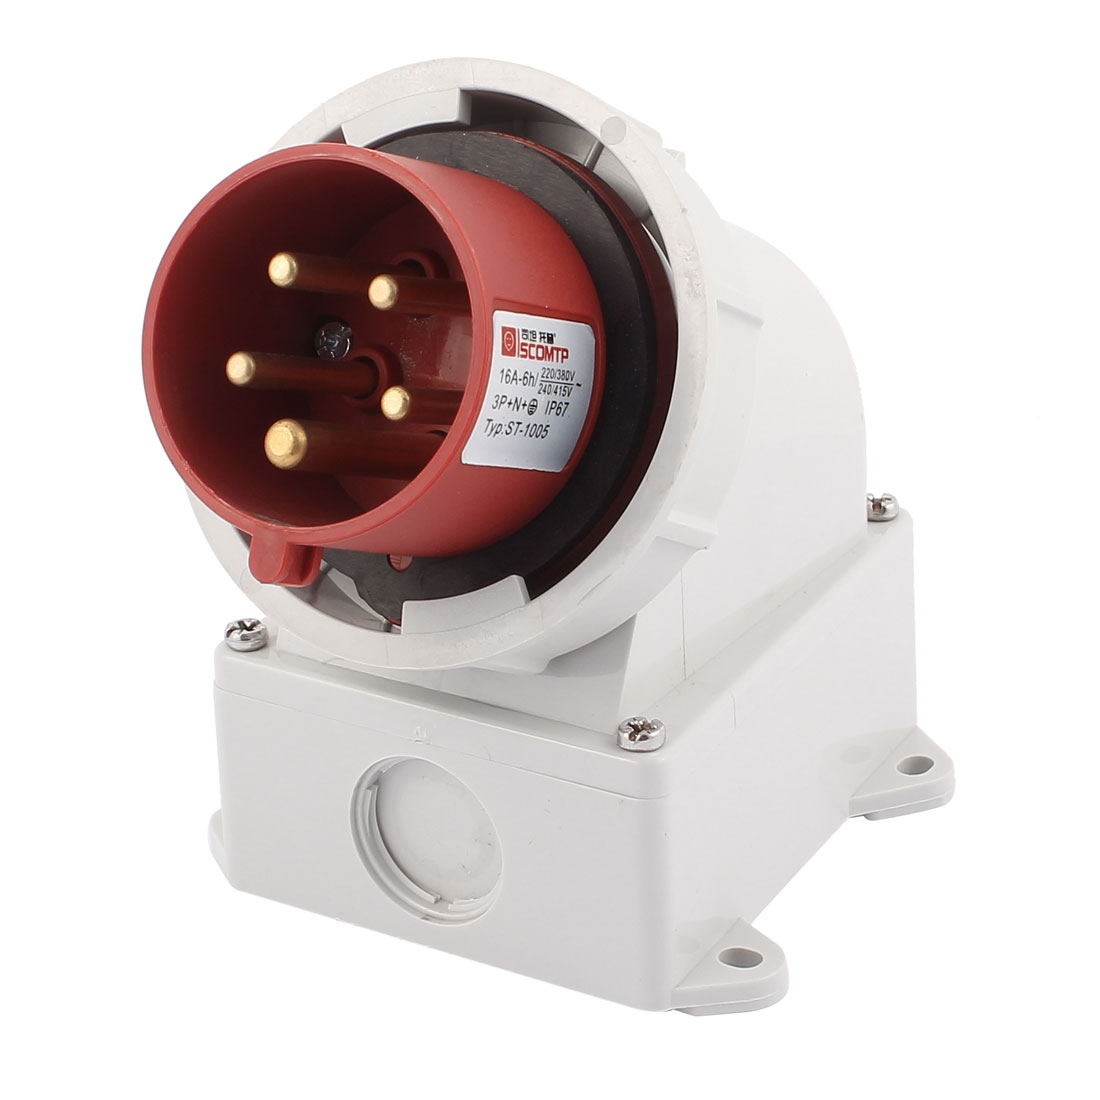 AC 240V-415V 16A IP67 3P+N+E 5-Terminal Male Industrial Caravan Plug